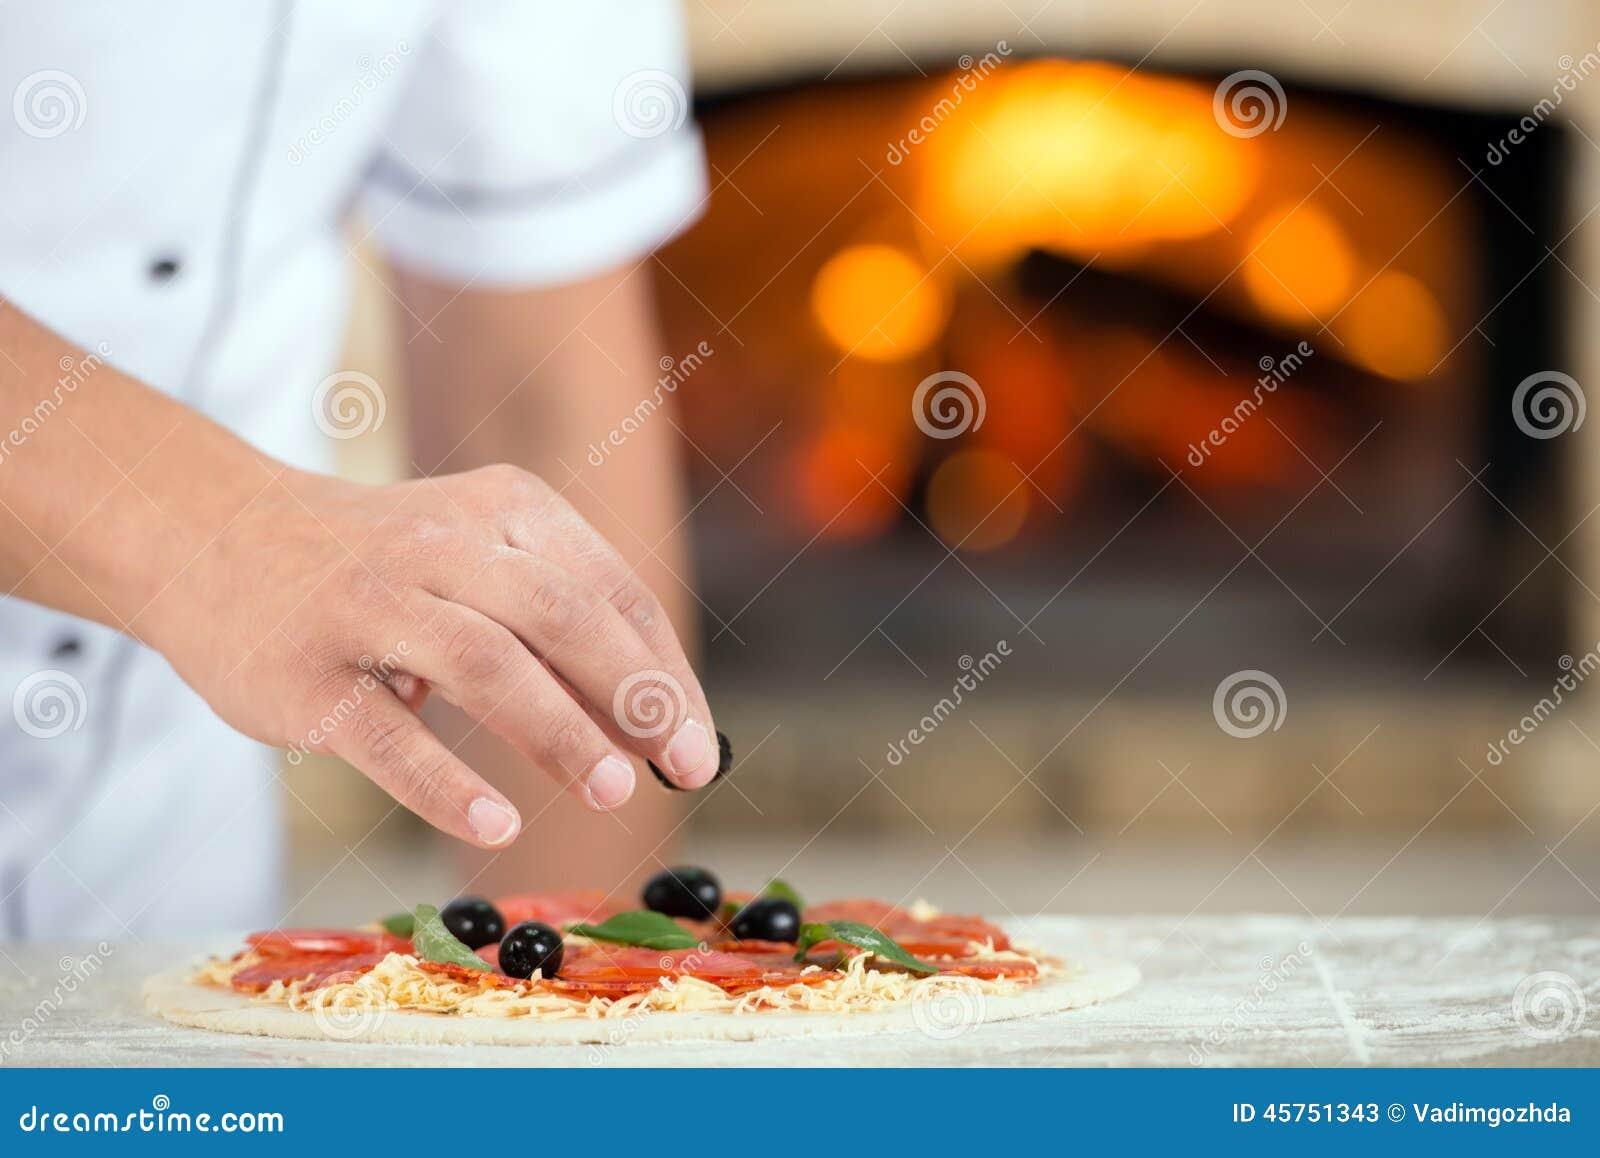 Pizzeria